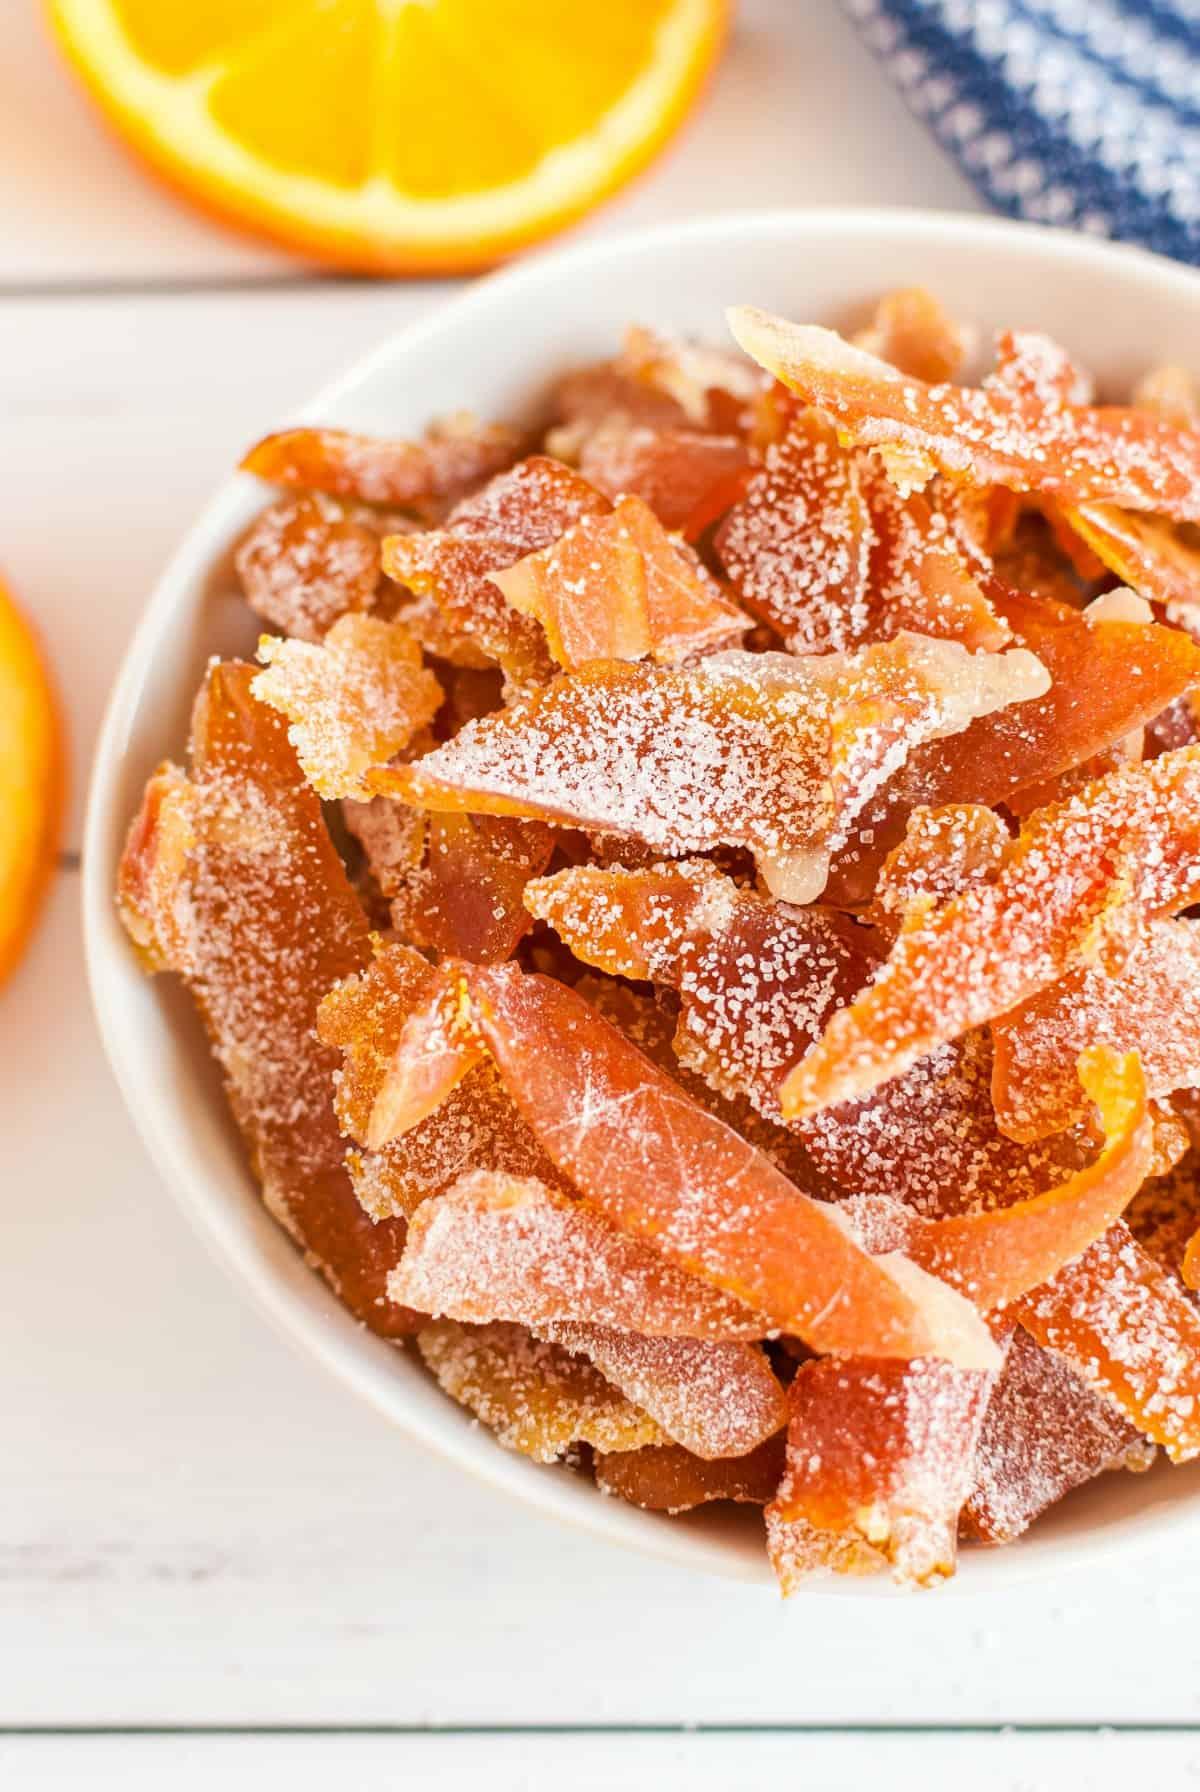 Slices of orange peel coated in sugar in a white bowl.